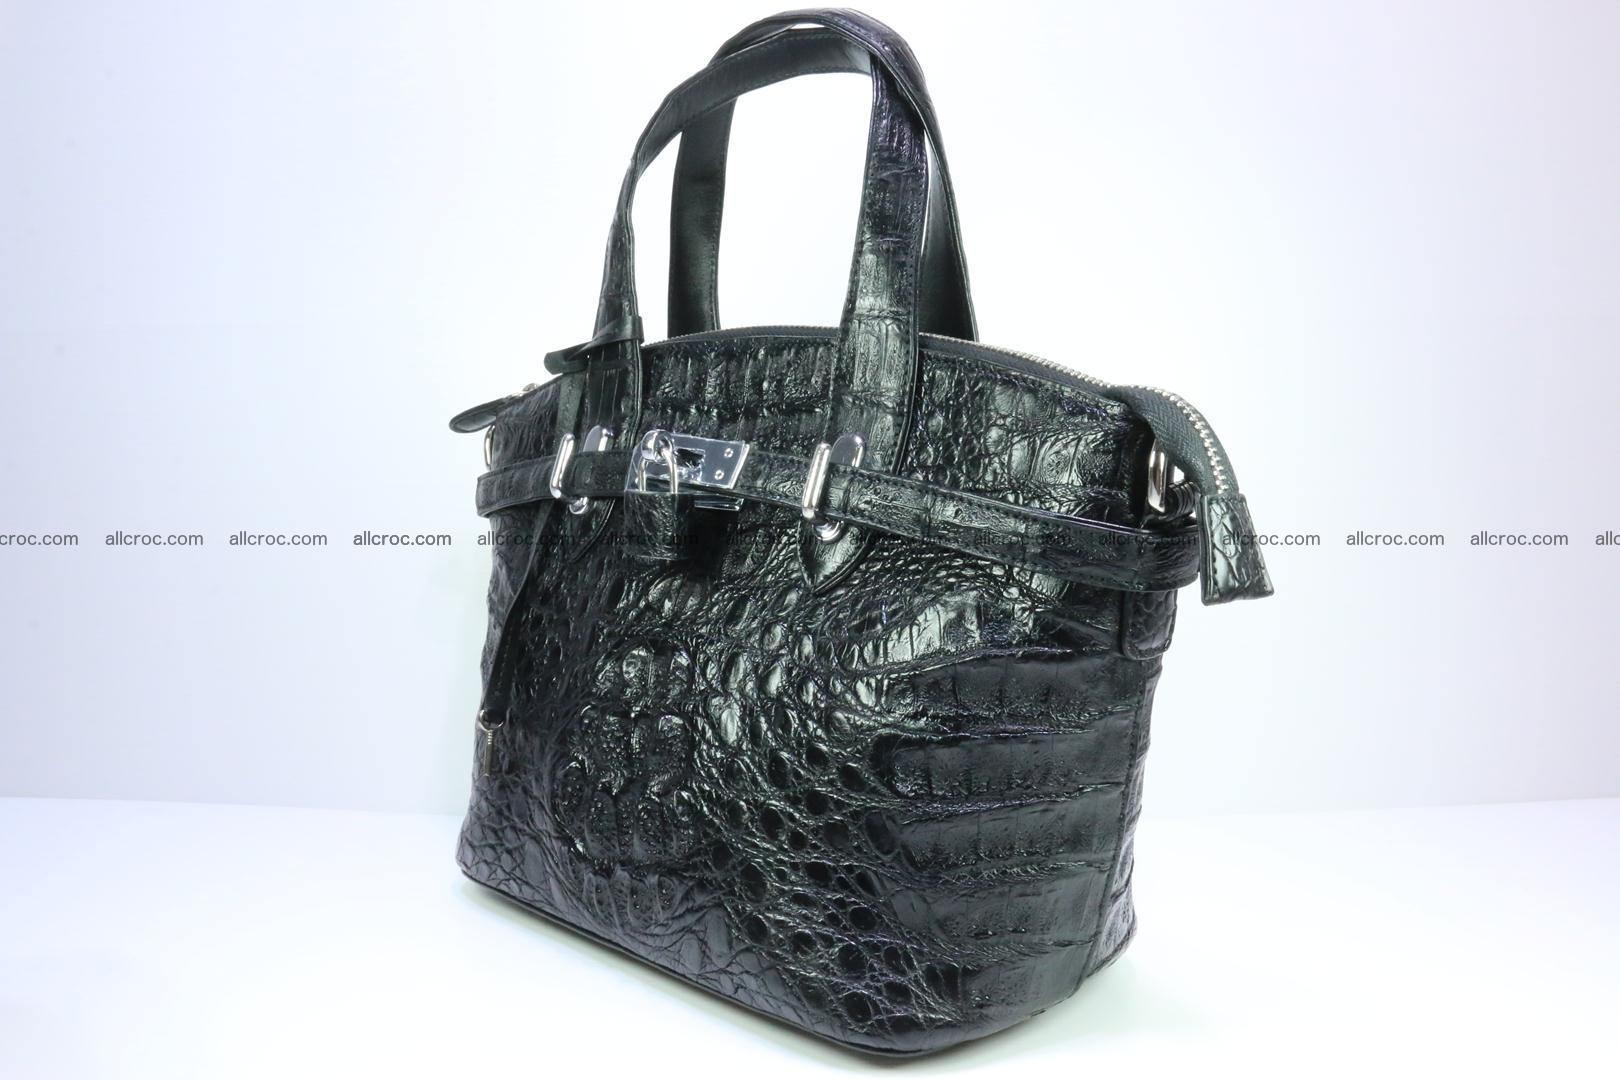 Genuine crocodile handbag for ladies 051 Foto 2